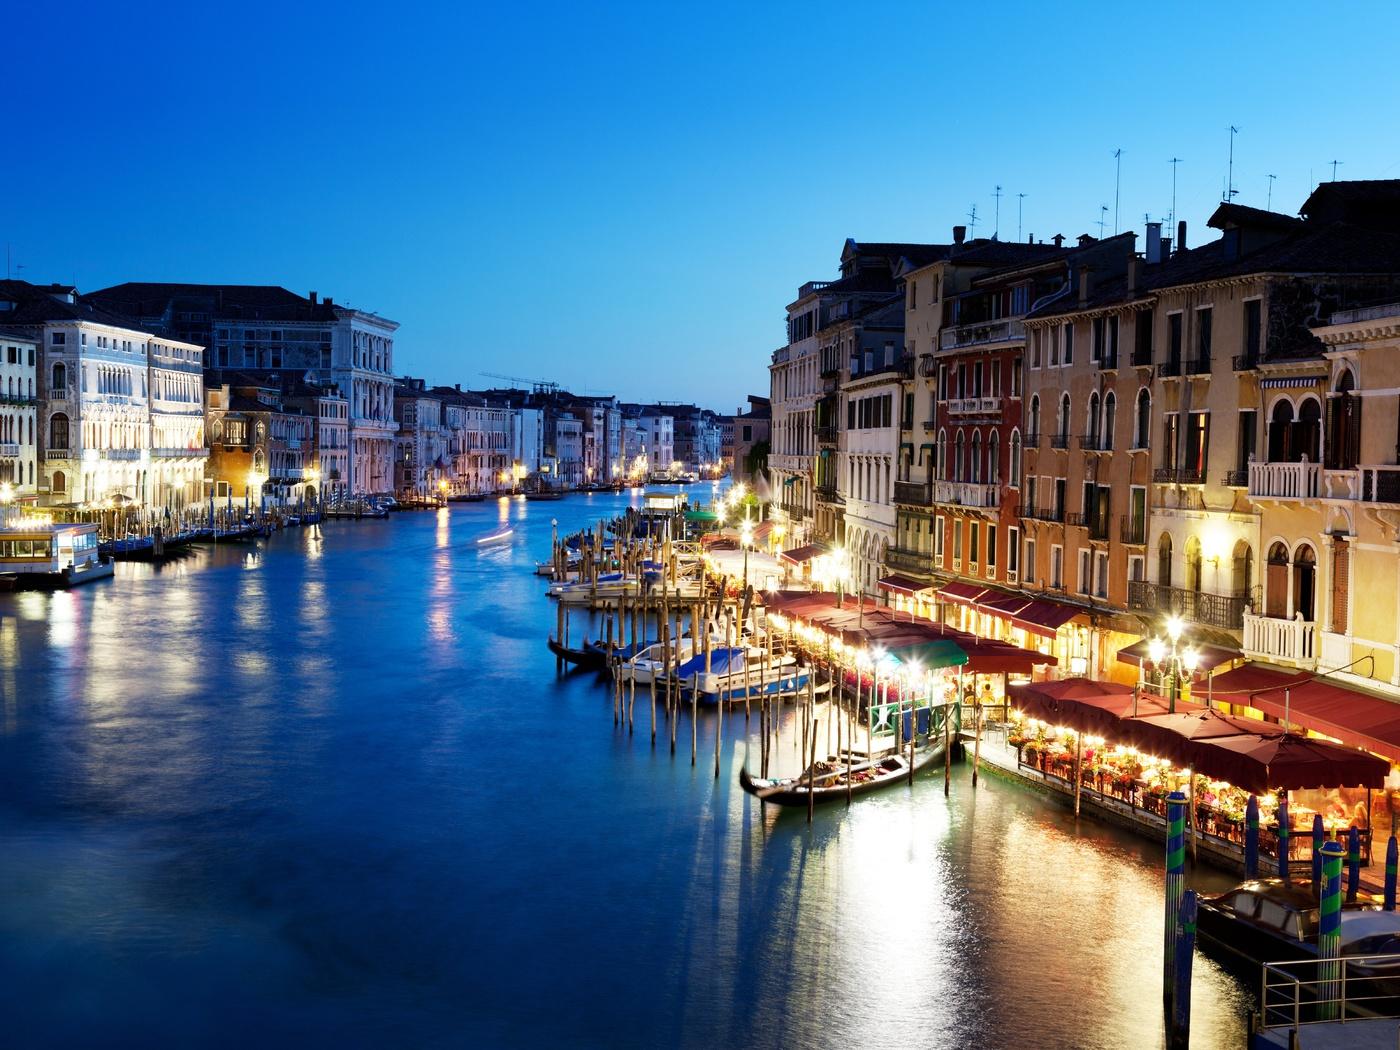 Гранд-канал, venice, венеция, италия, вечер, italy, canal grande